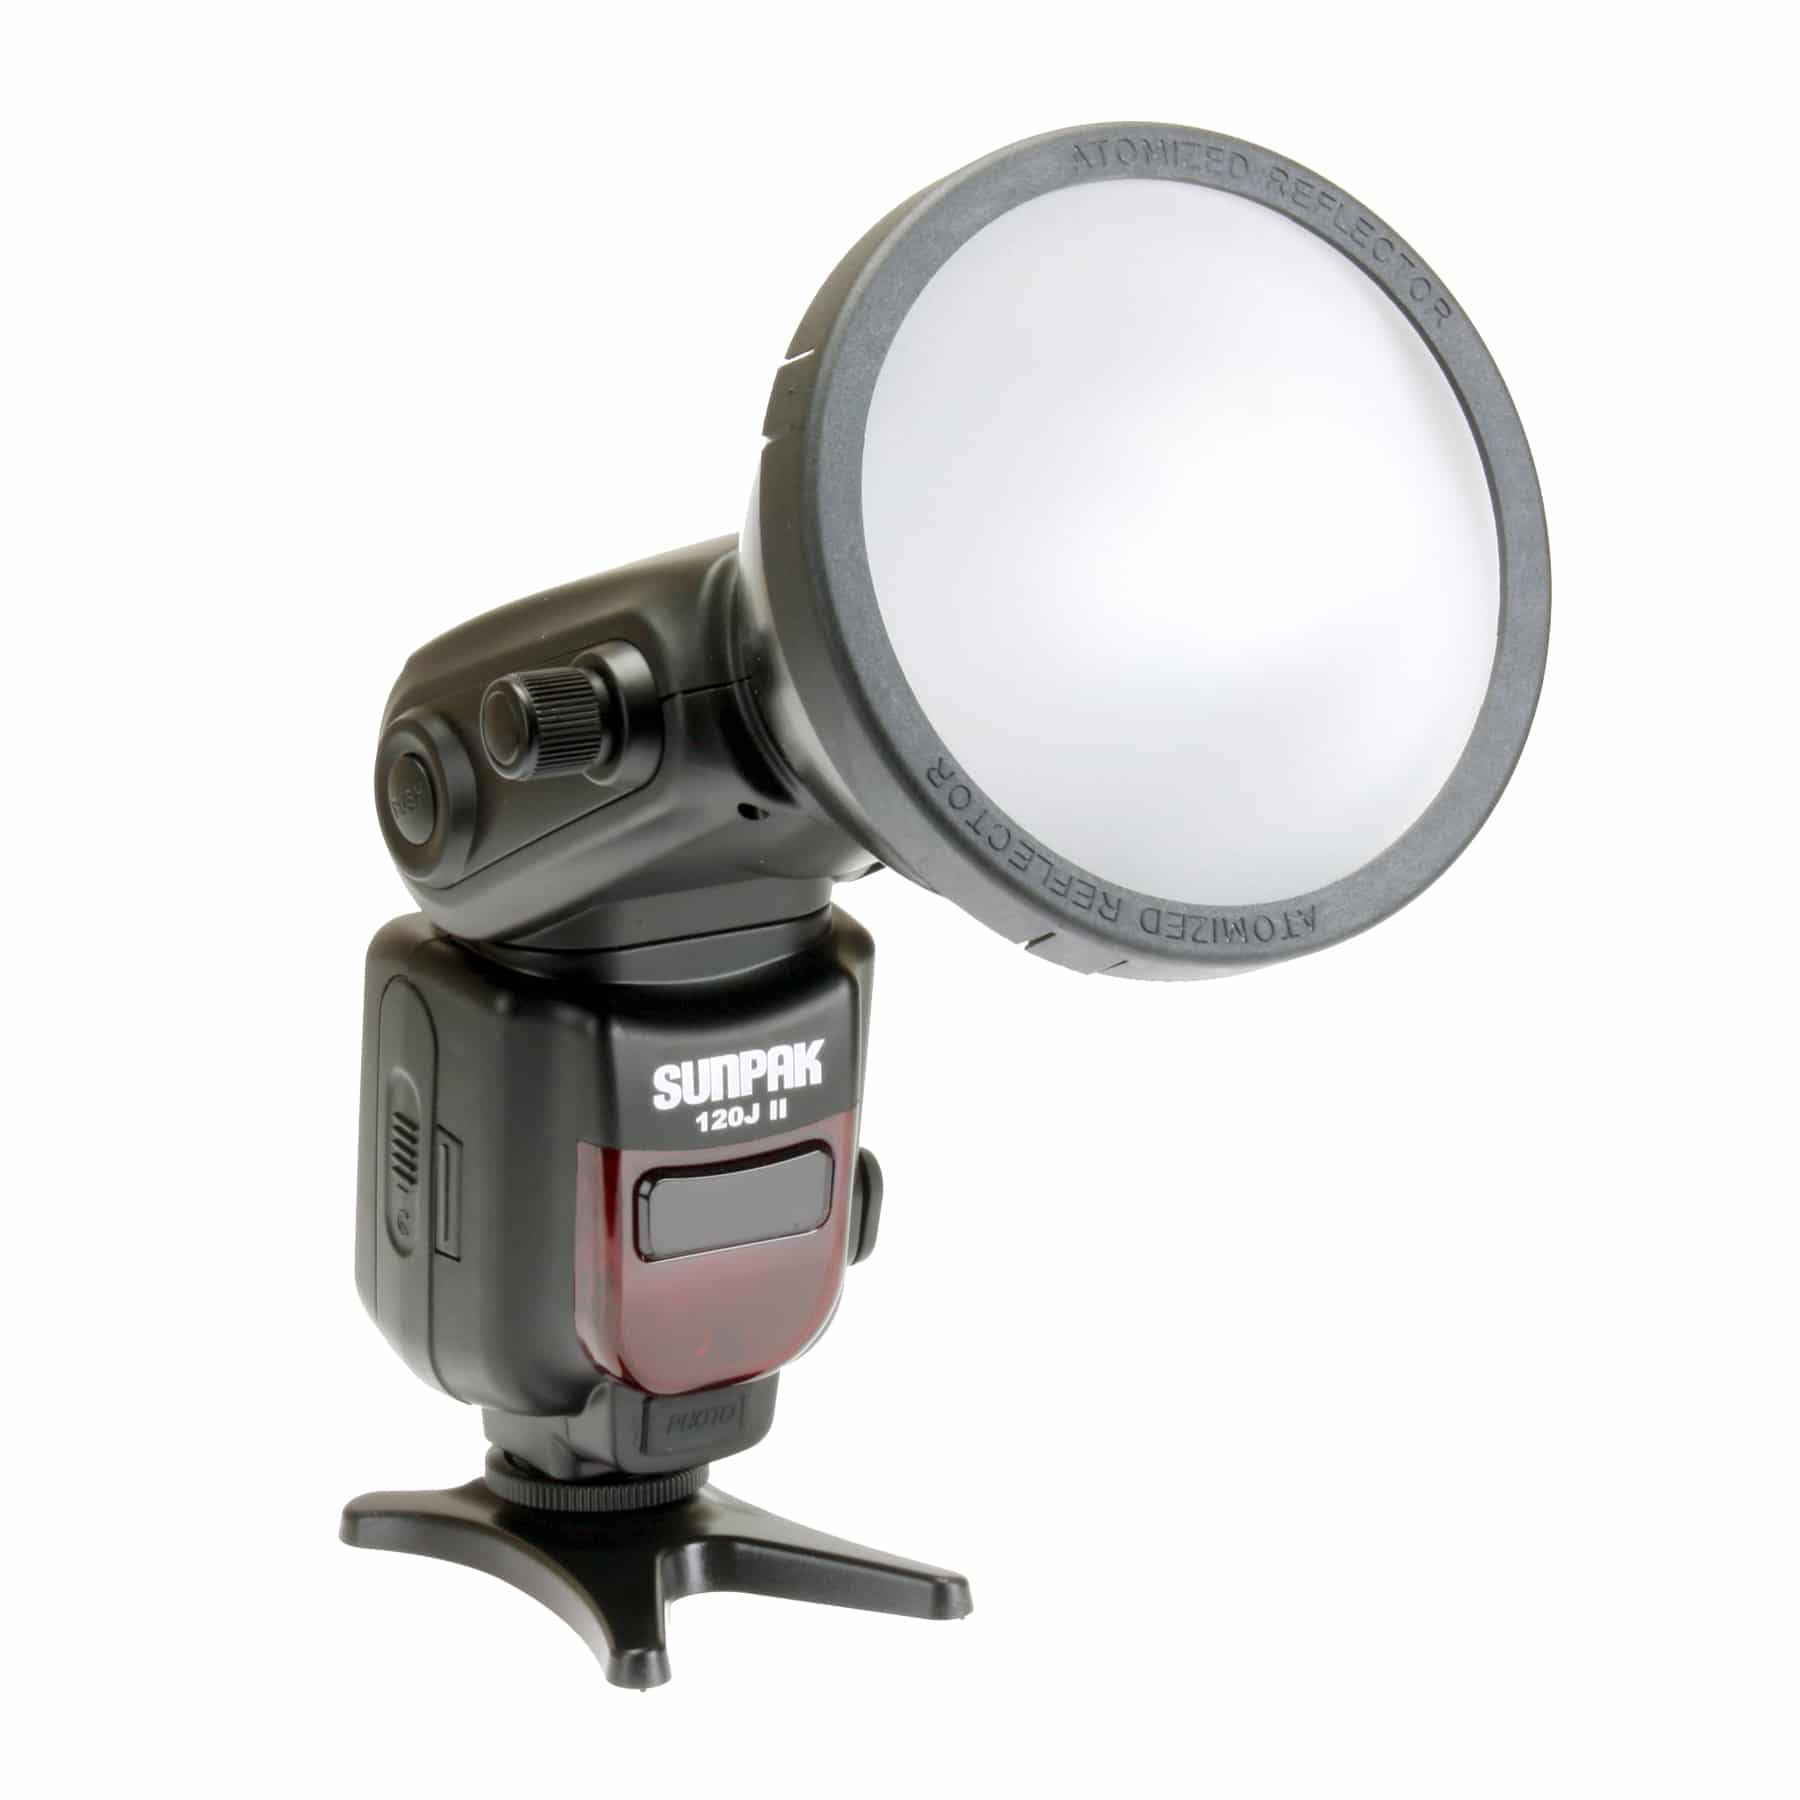 sunpak 120j ii flash tocad america rh tocad com Number 401 Camera Flash Guide Number Formula